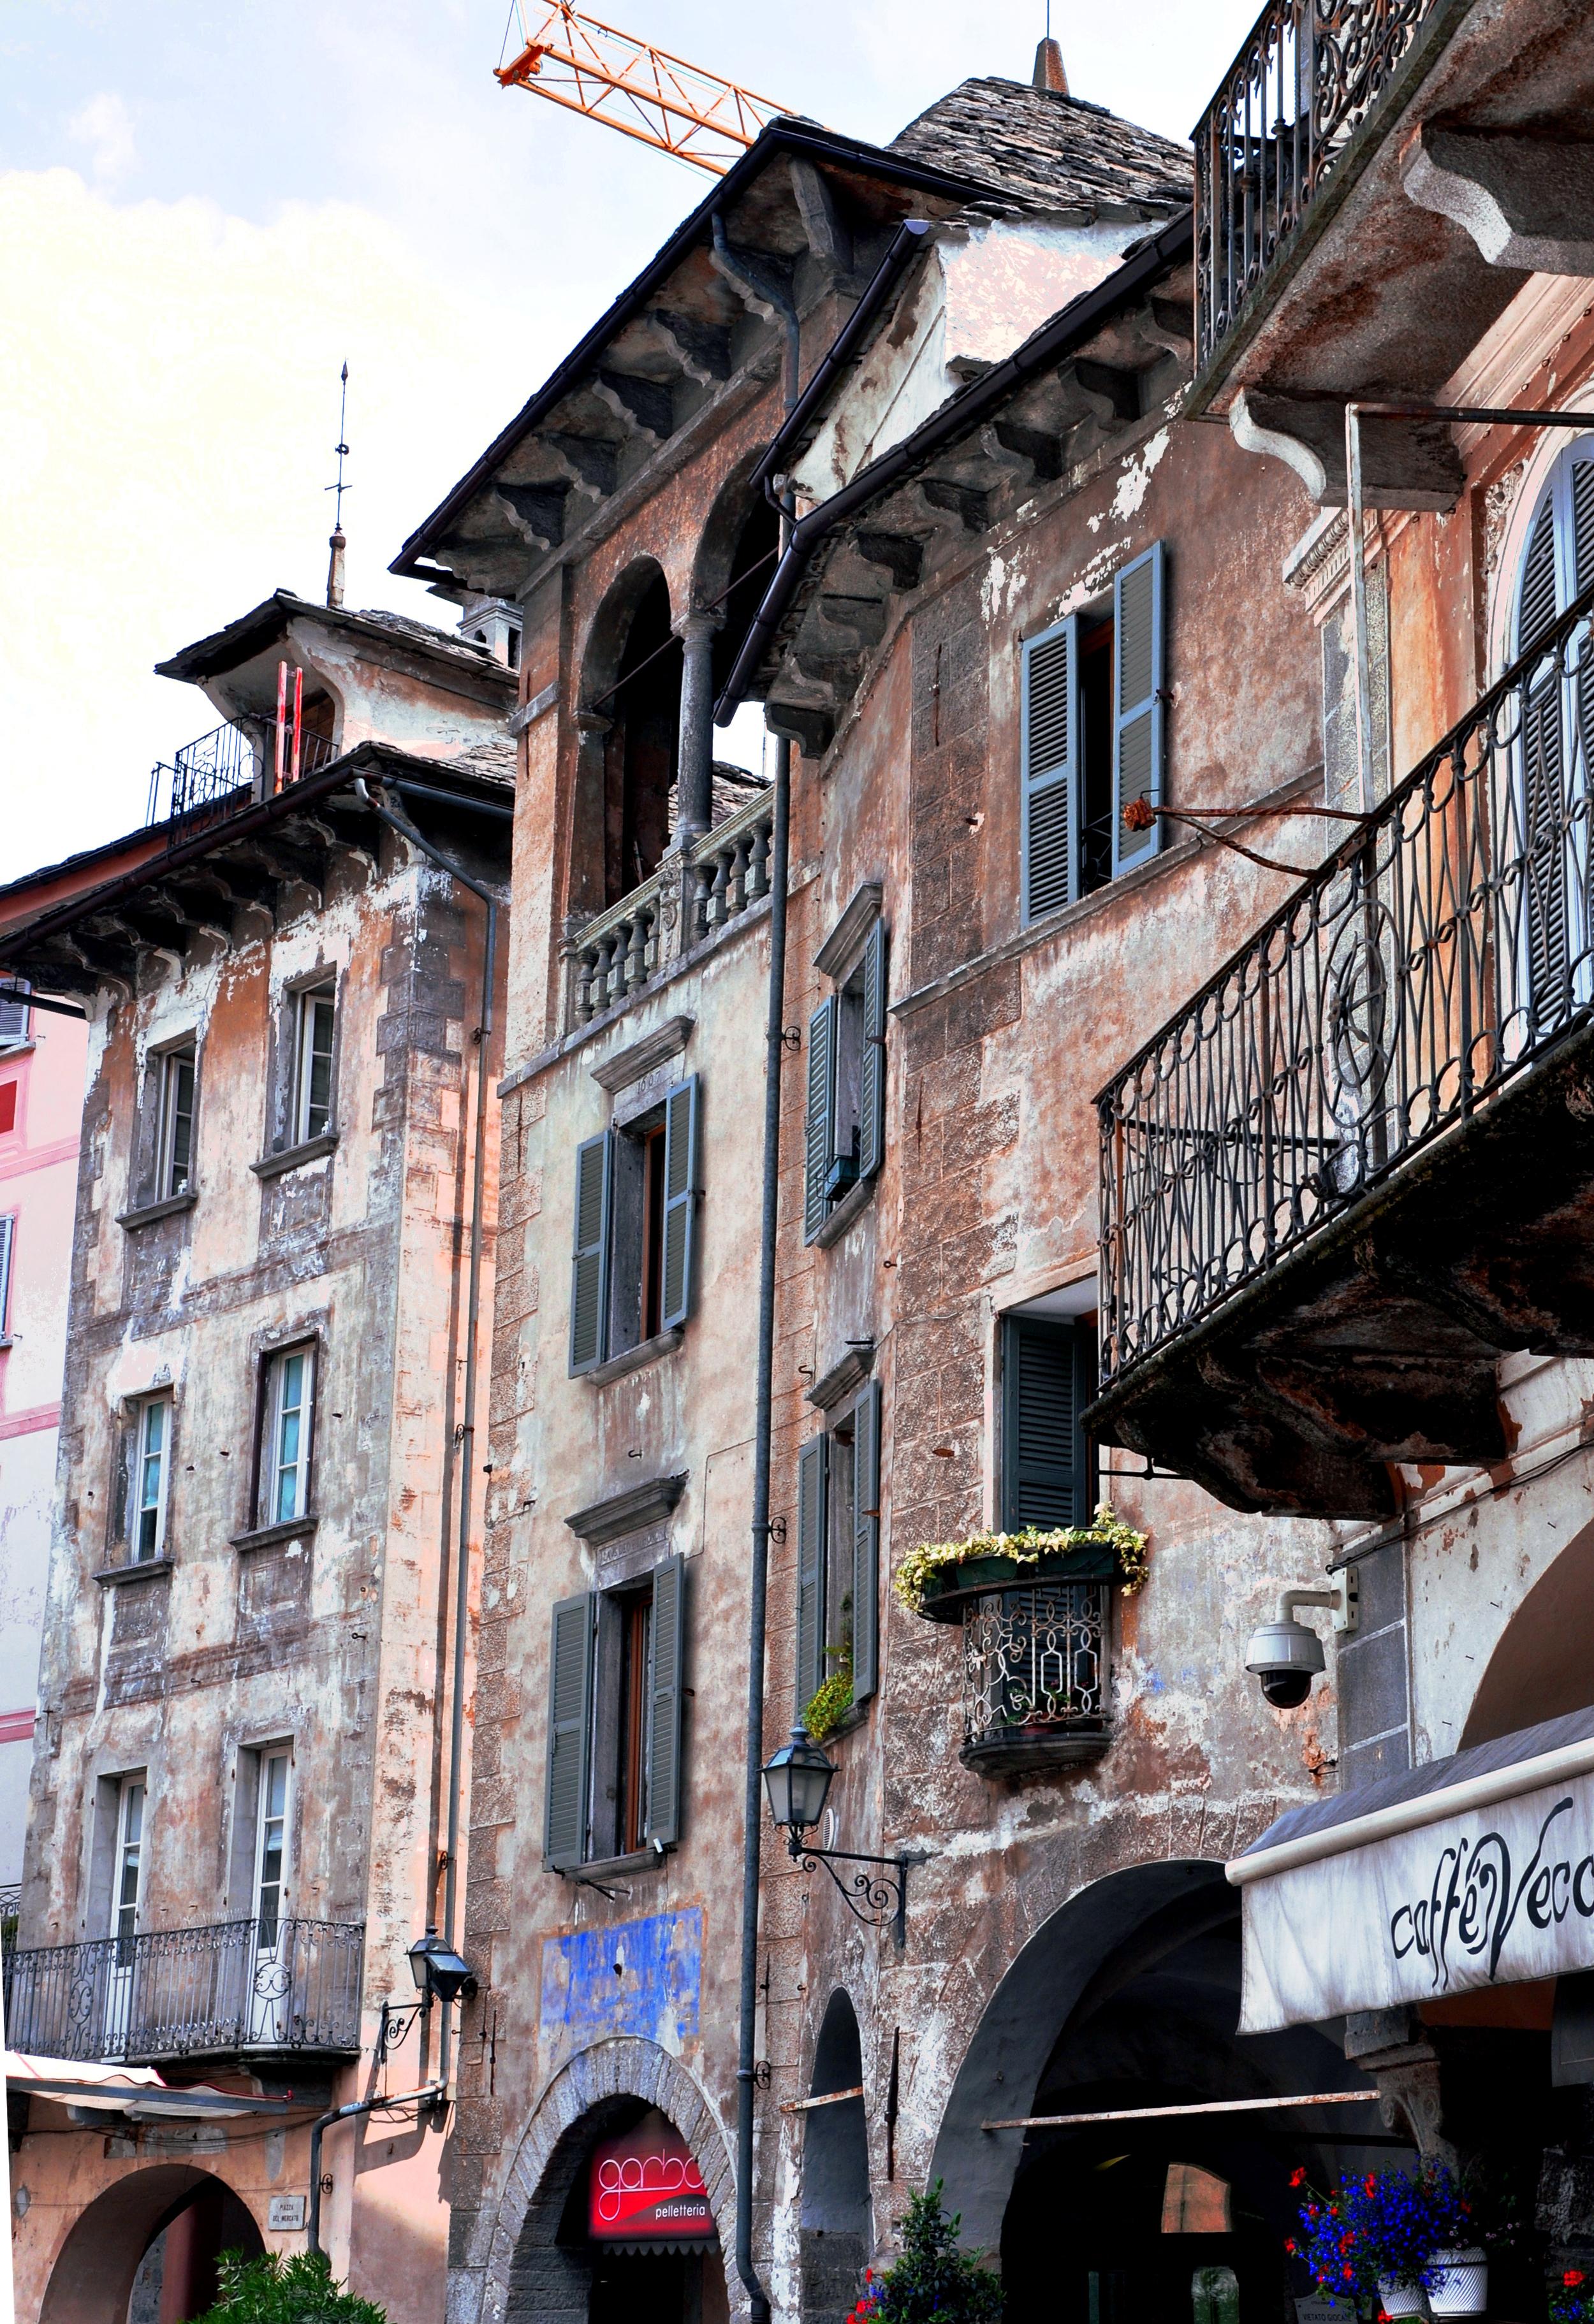 Domodossola architecture  ©Copyright 2015Bridget Barnes